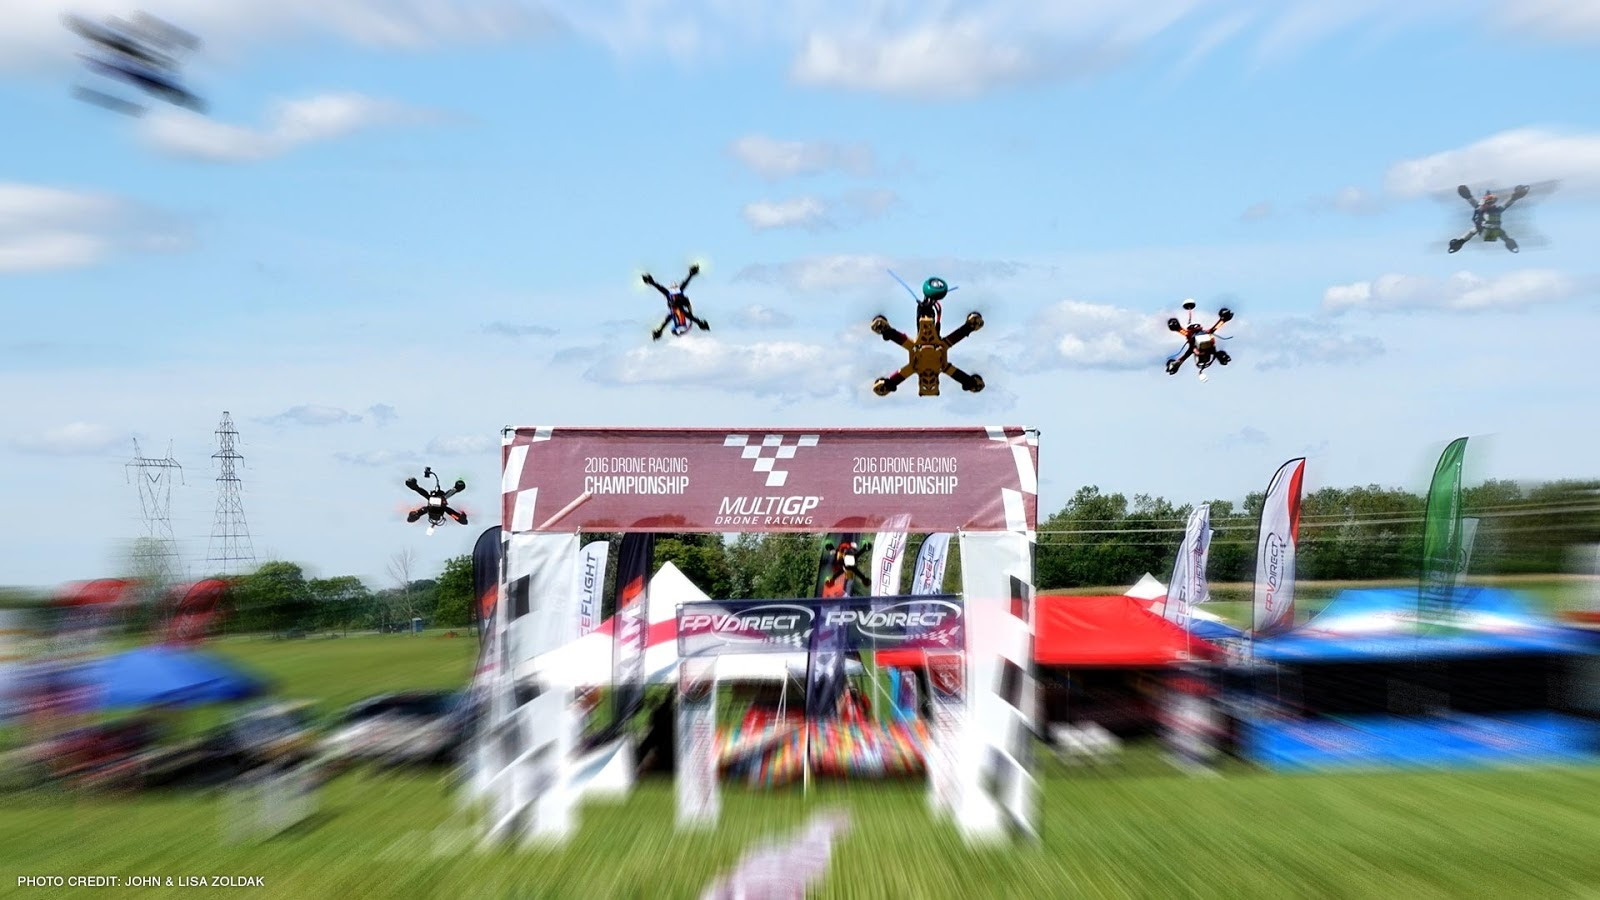 multigp-drone-racing-championship-start-finish